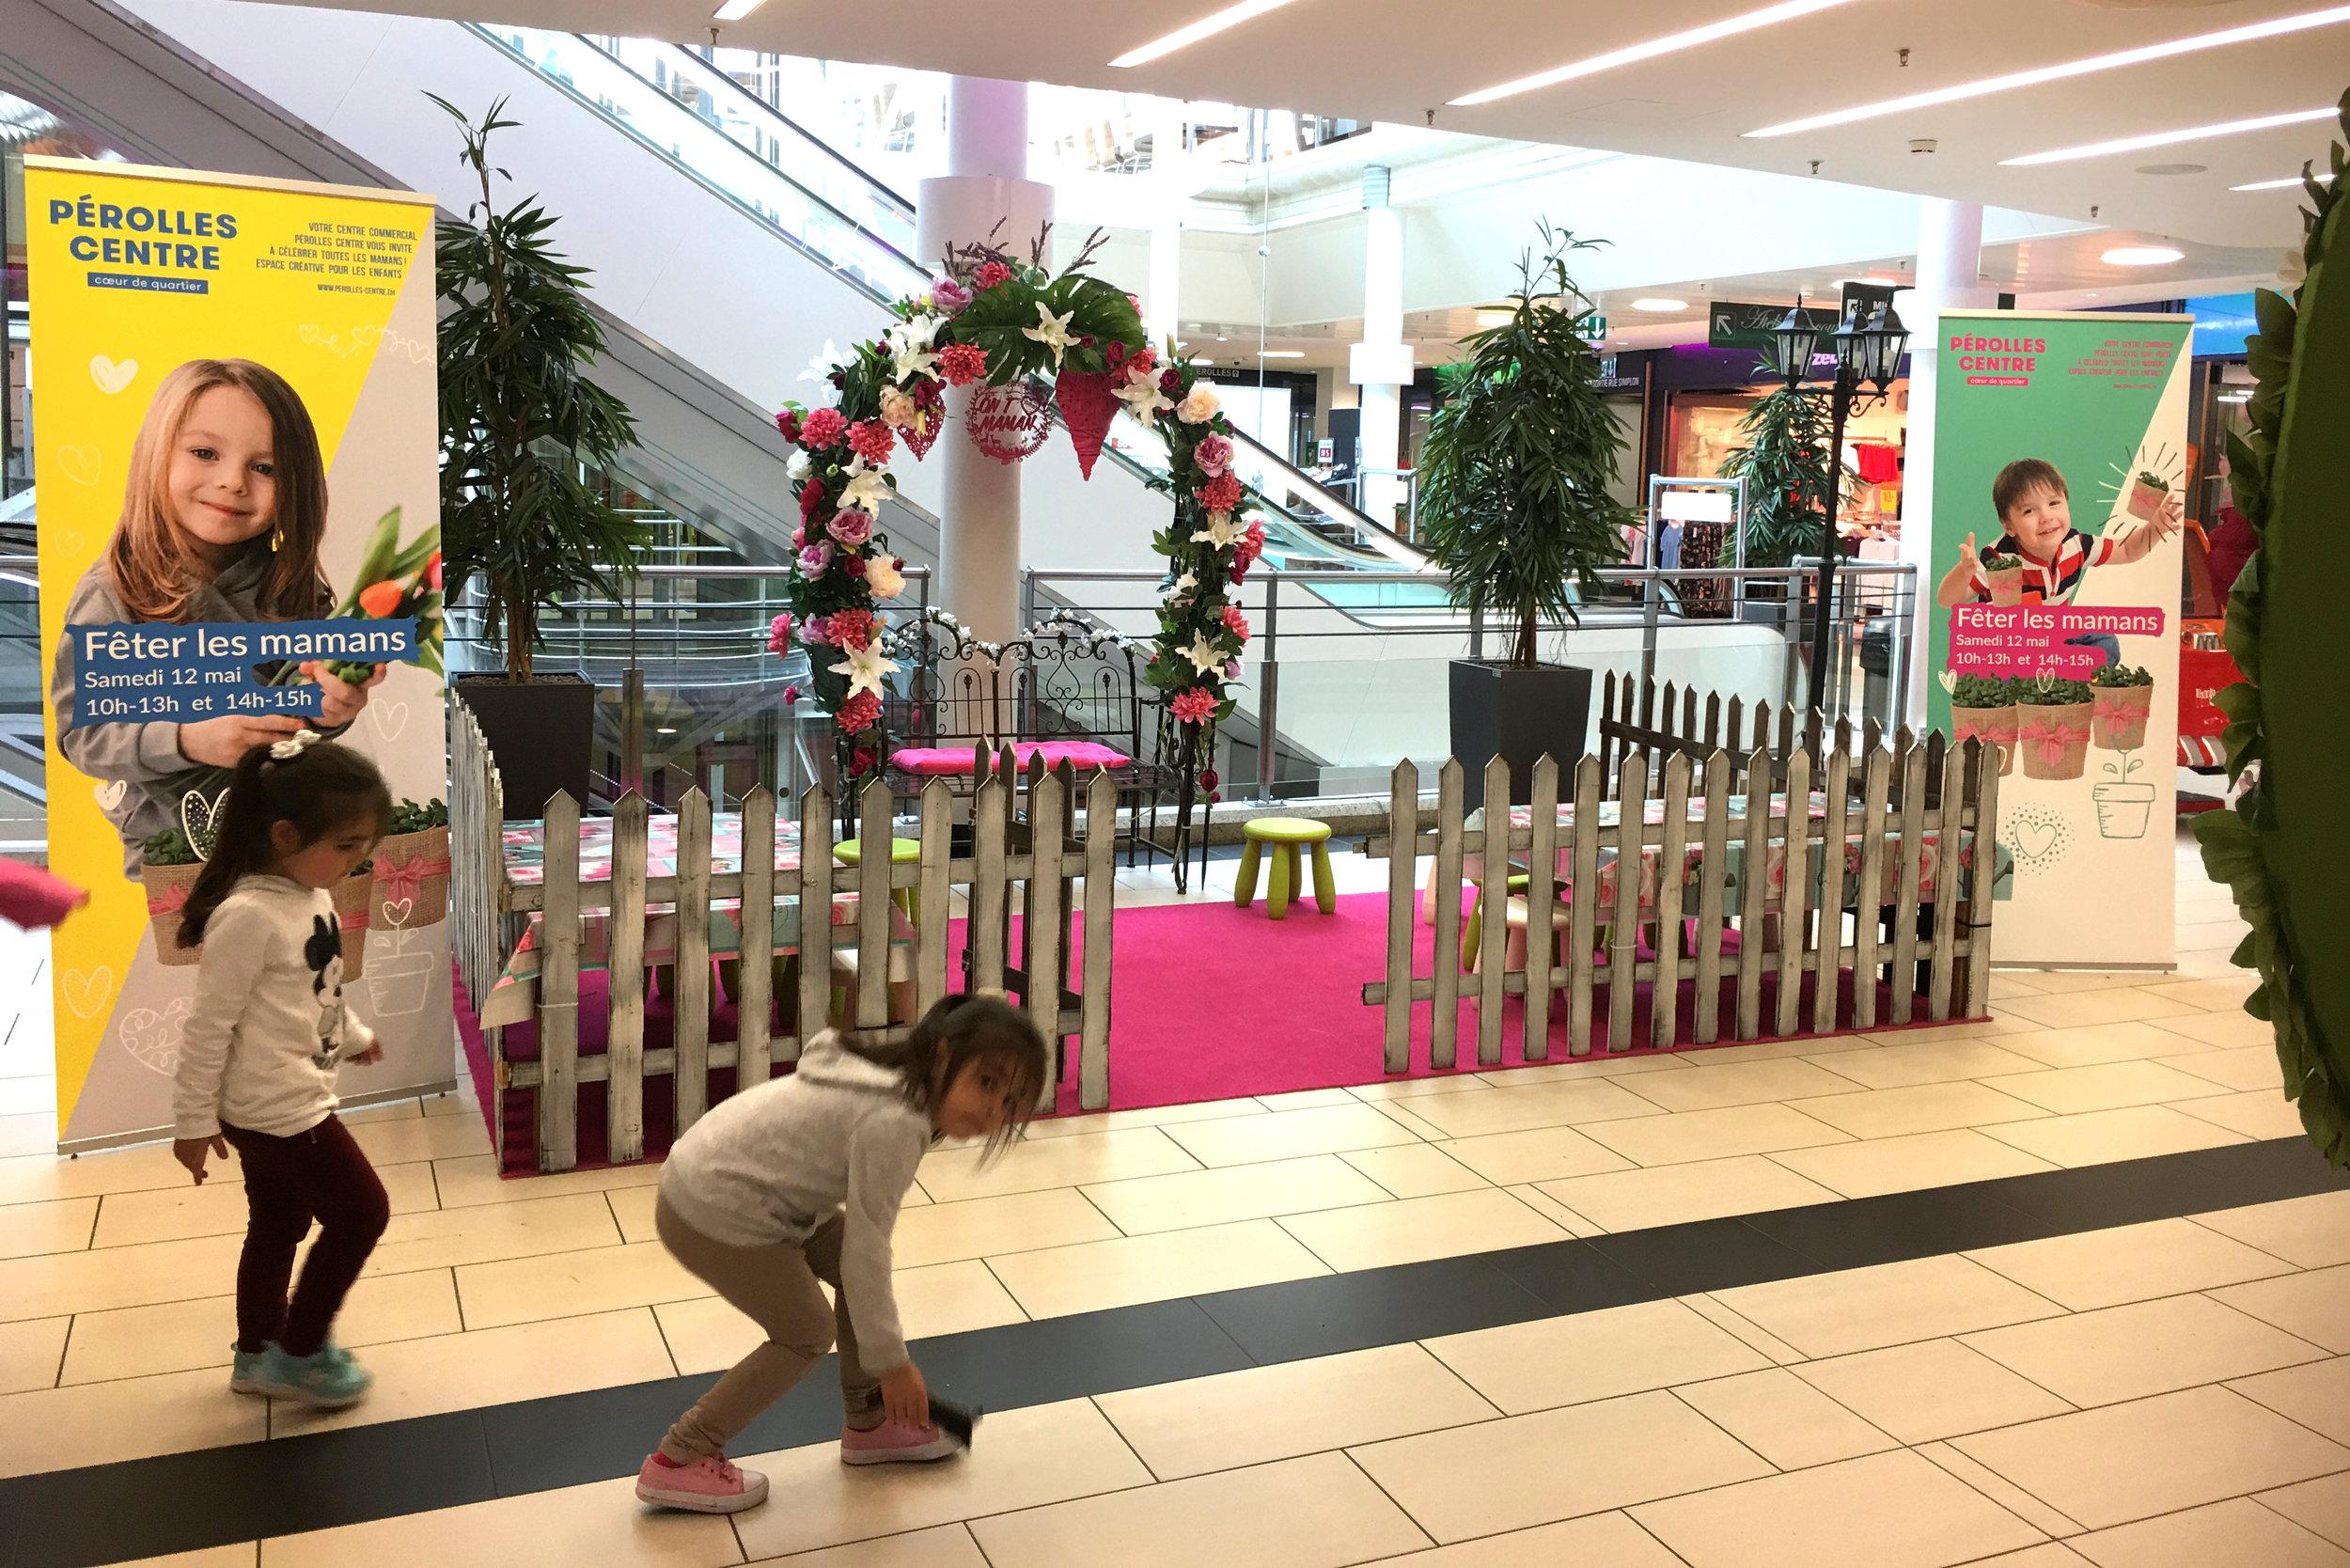 stand-decoration-rose-moms-day.jpg